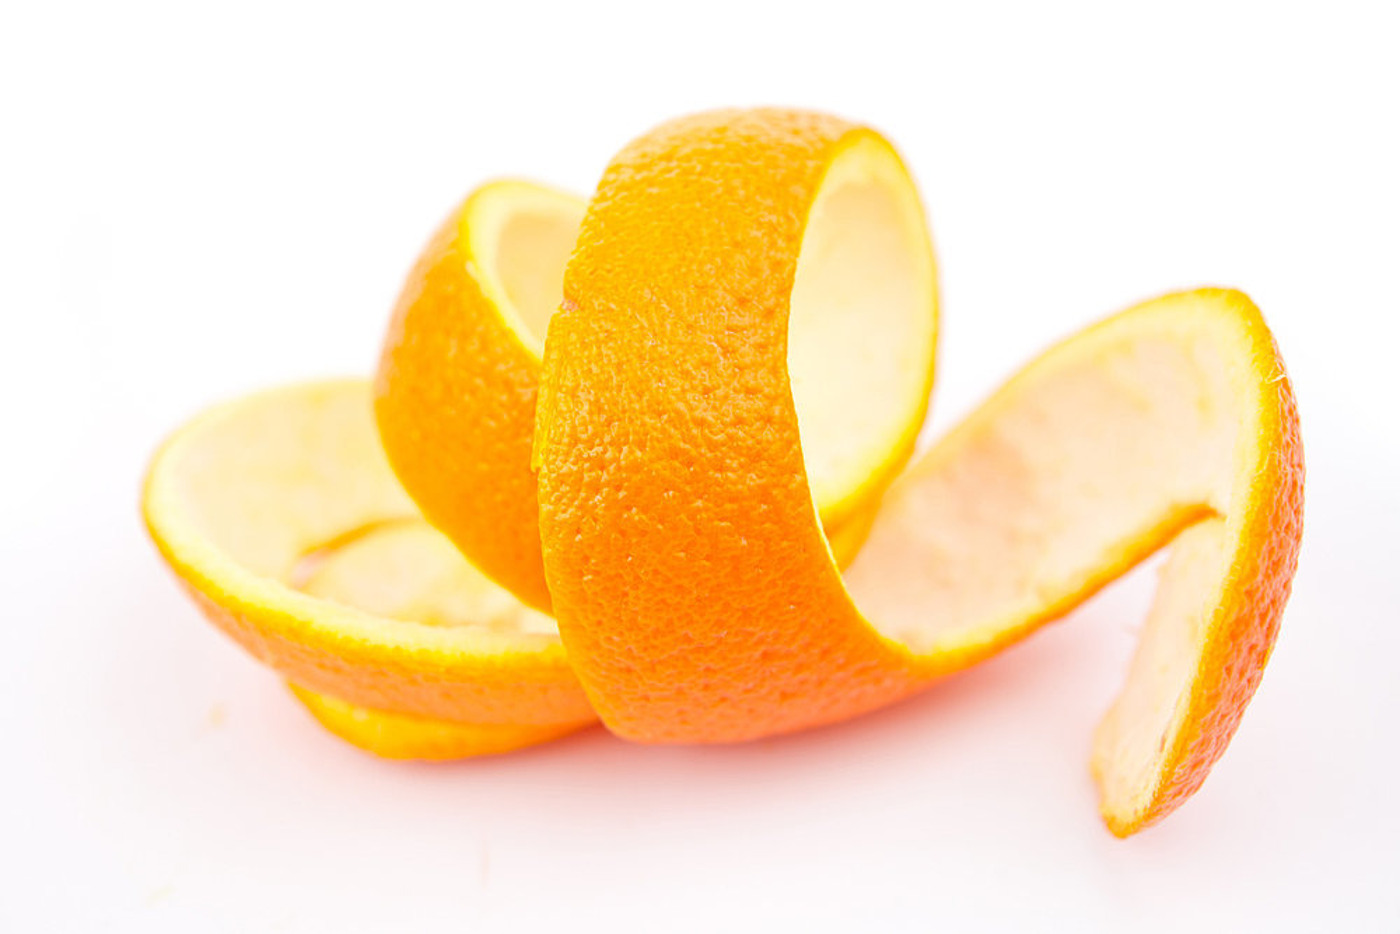 cellulite-buccia-arancia